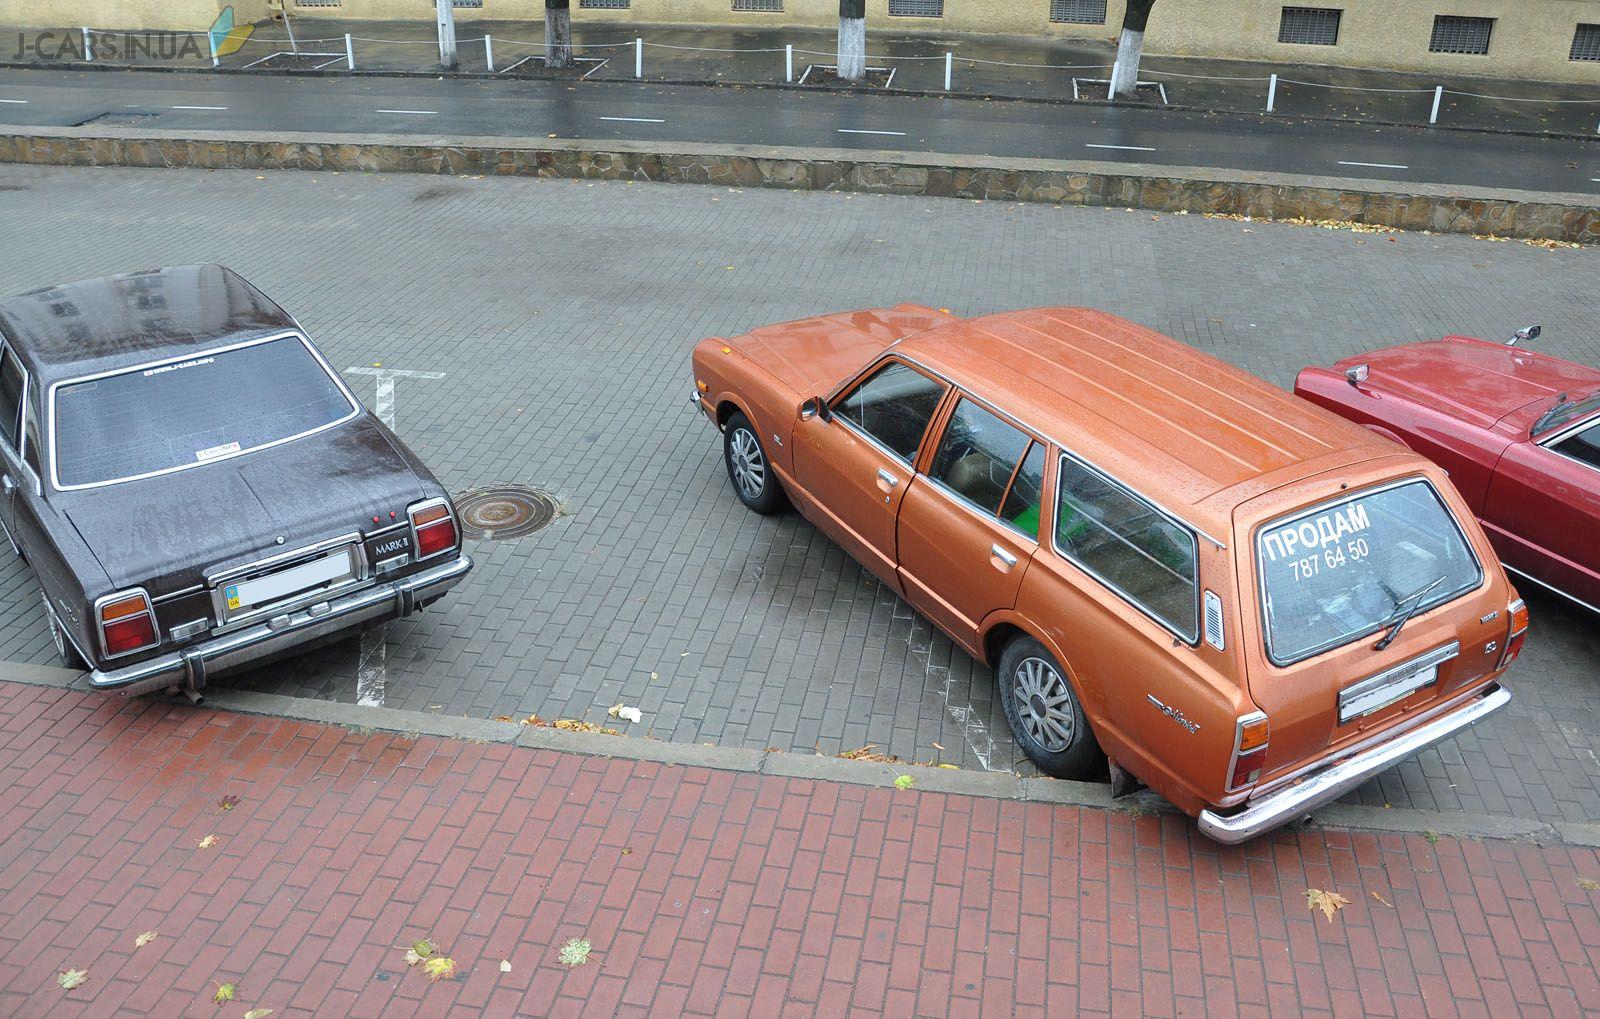 j-cars.in.ua сбор октябрь 2011